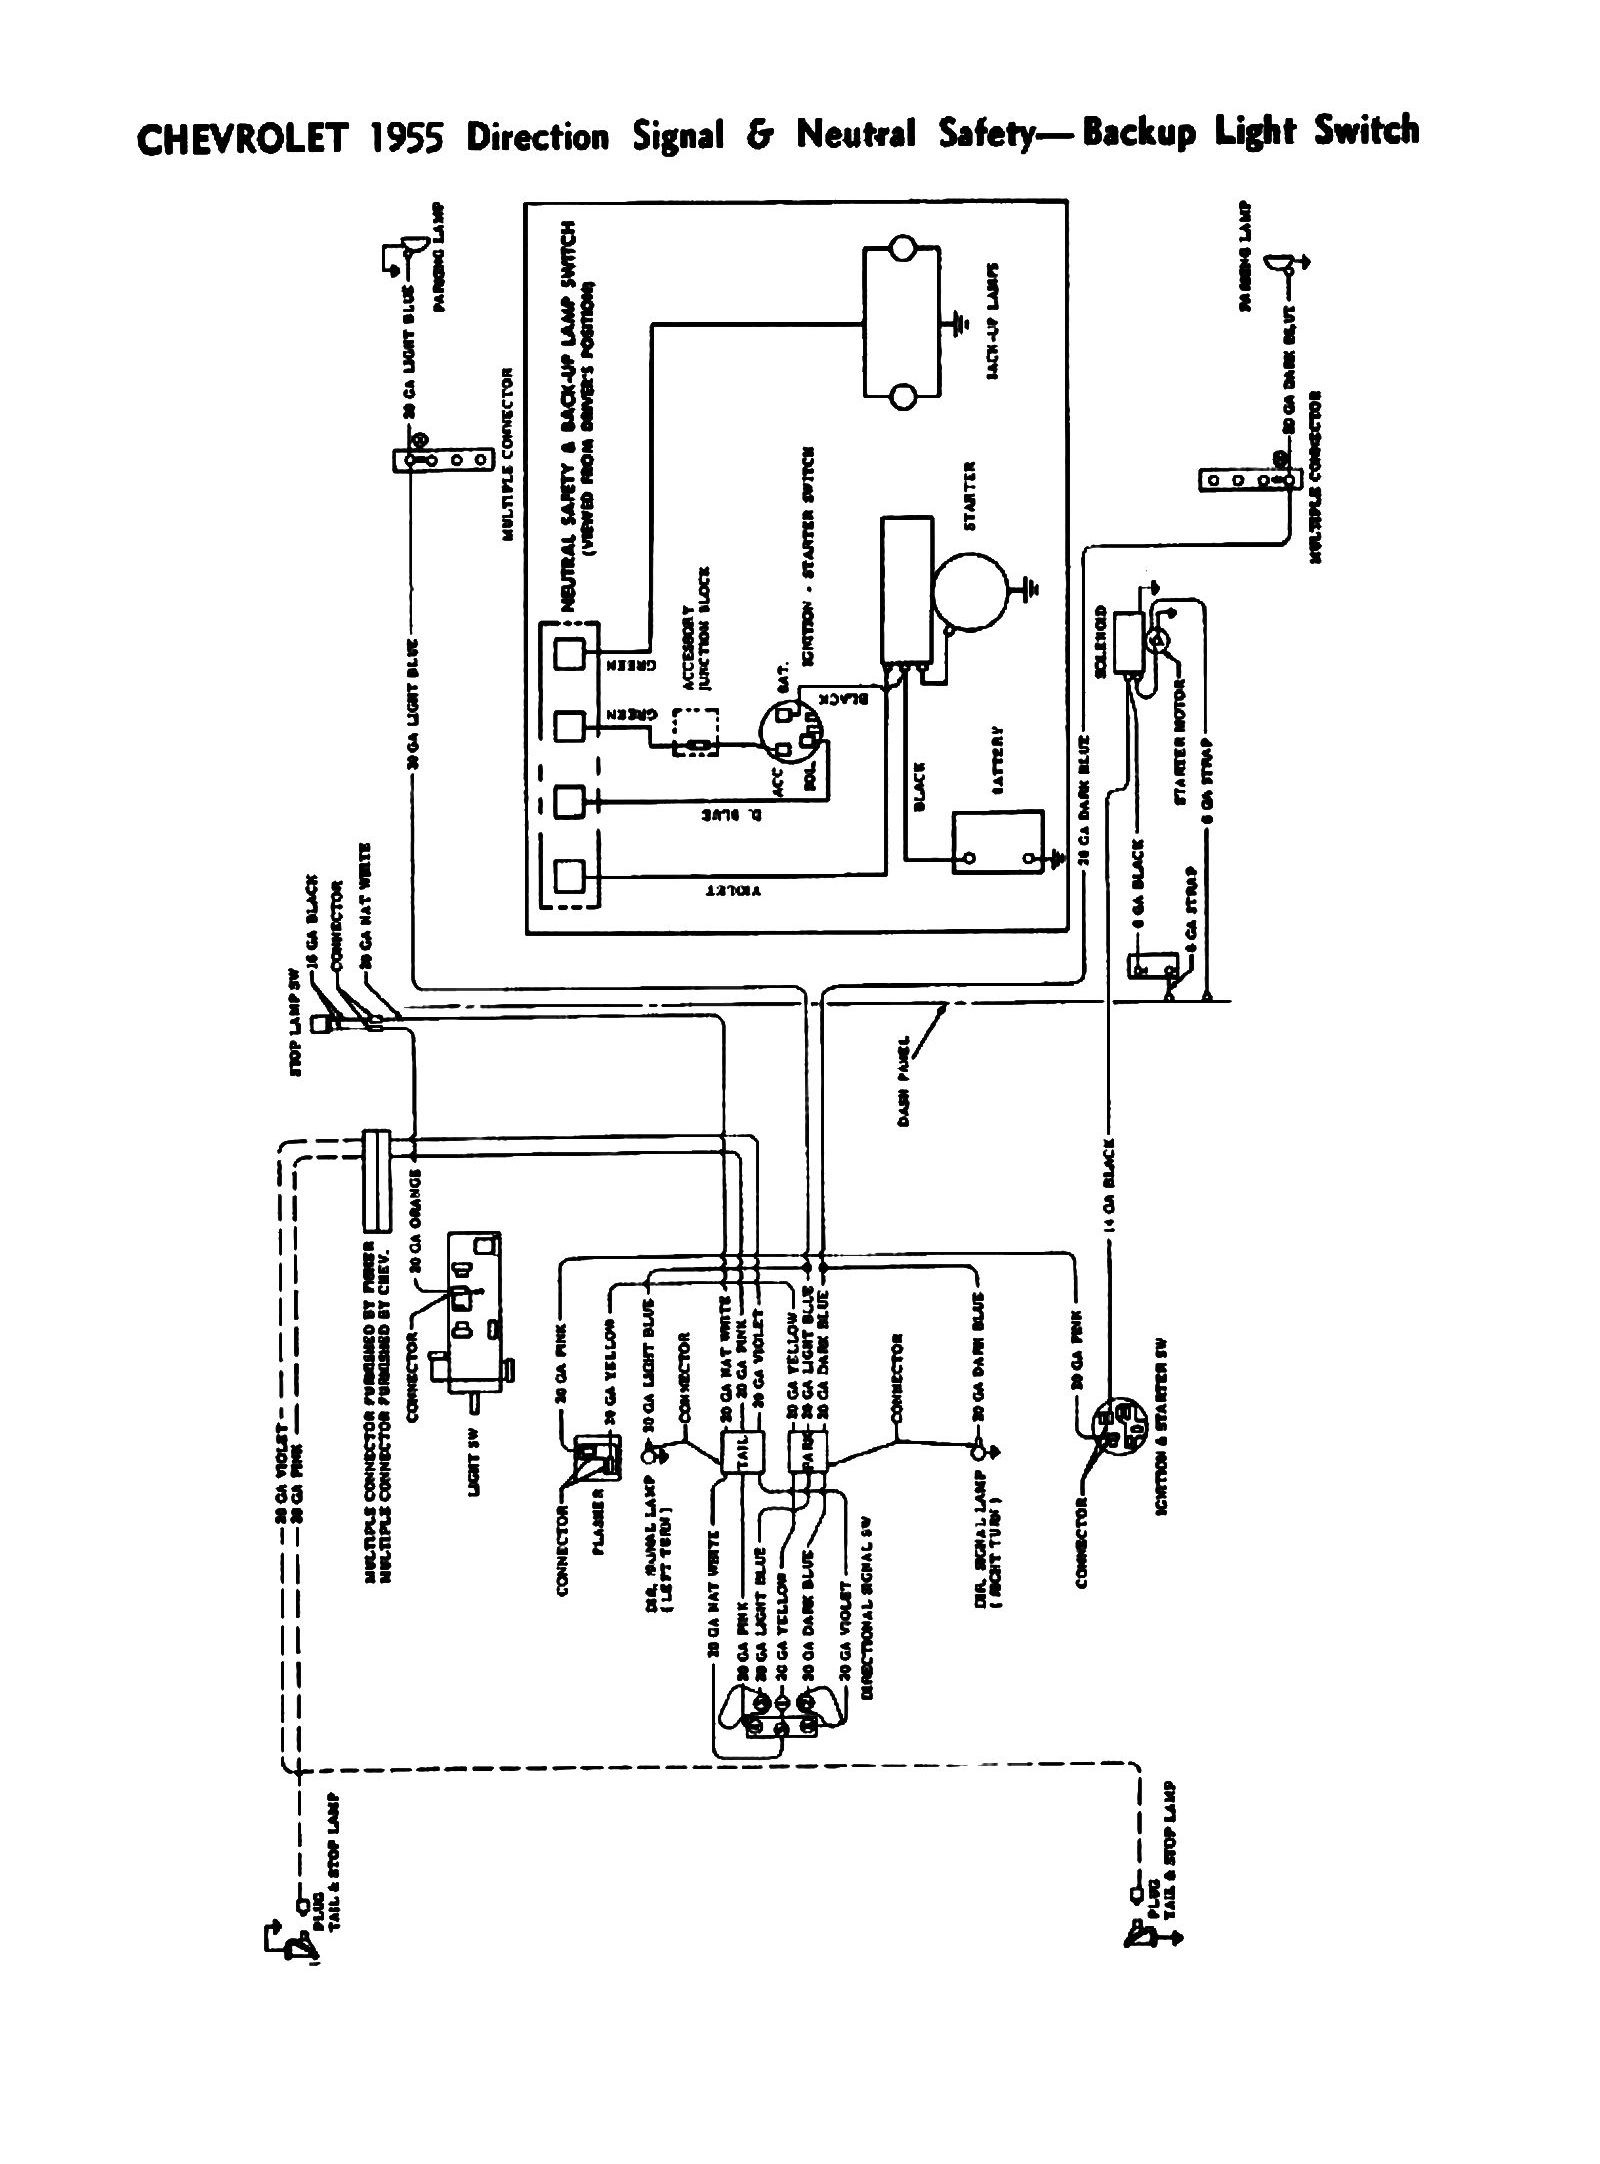 69 Corvette Starter Wiring Diagram Trusted 1954 Electrical Work U2022 Rh Aglabs Co 1969